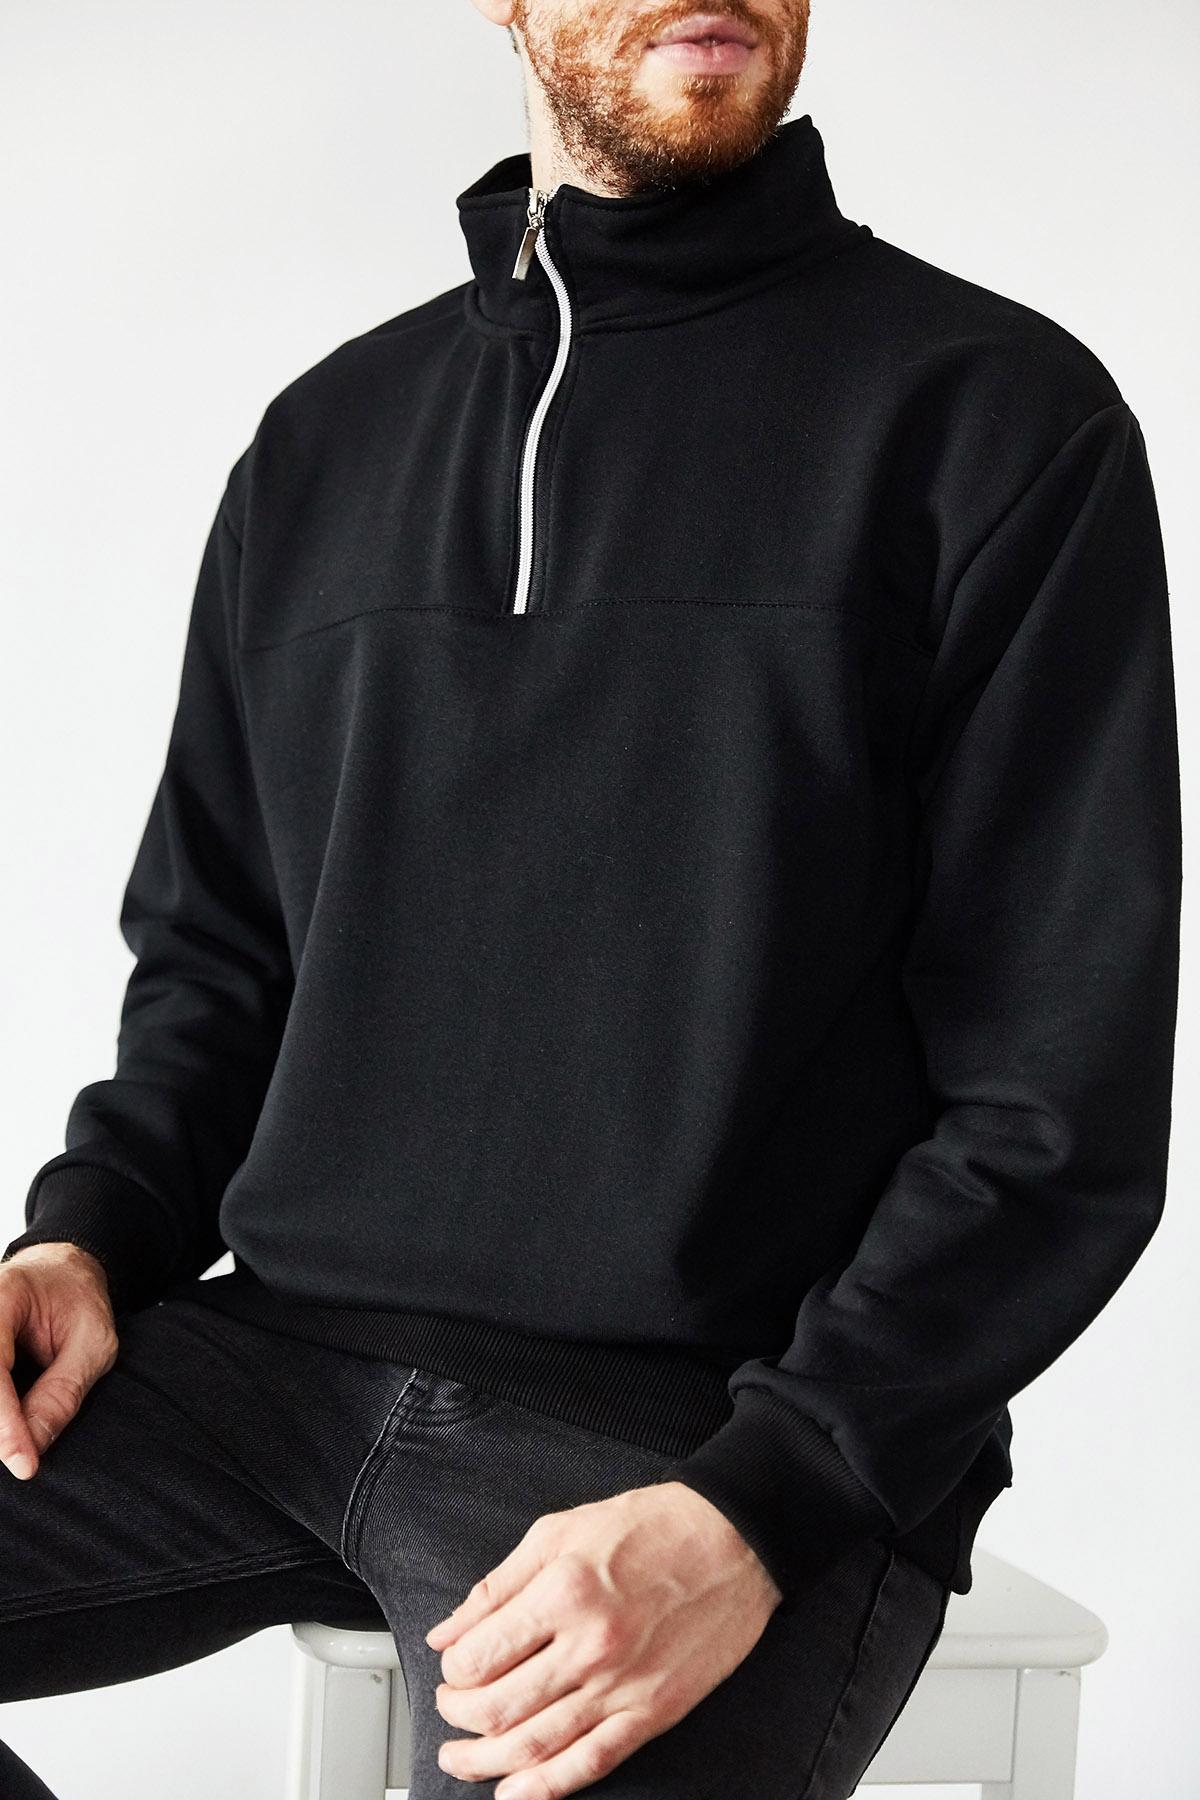 XHAN - Siyah Yakası Fermuarlı Sweatshirt 1KXE8-44172-02